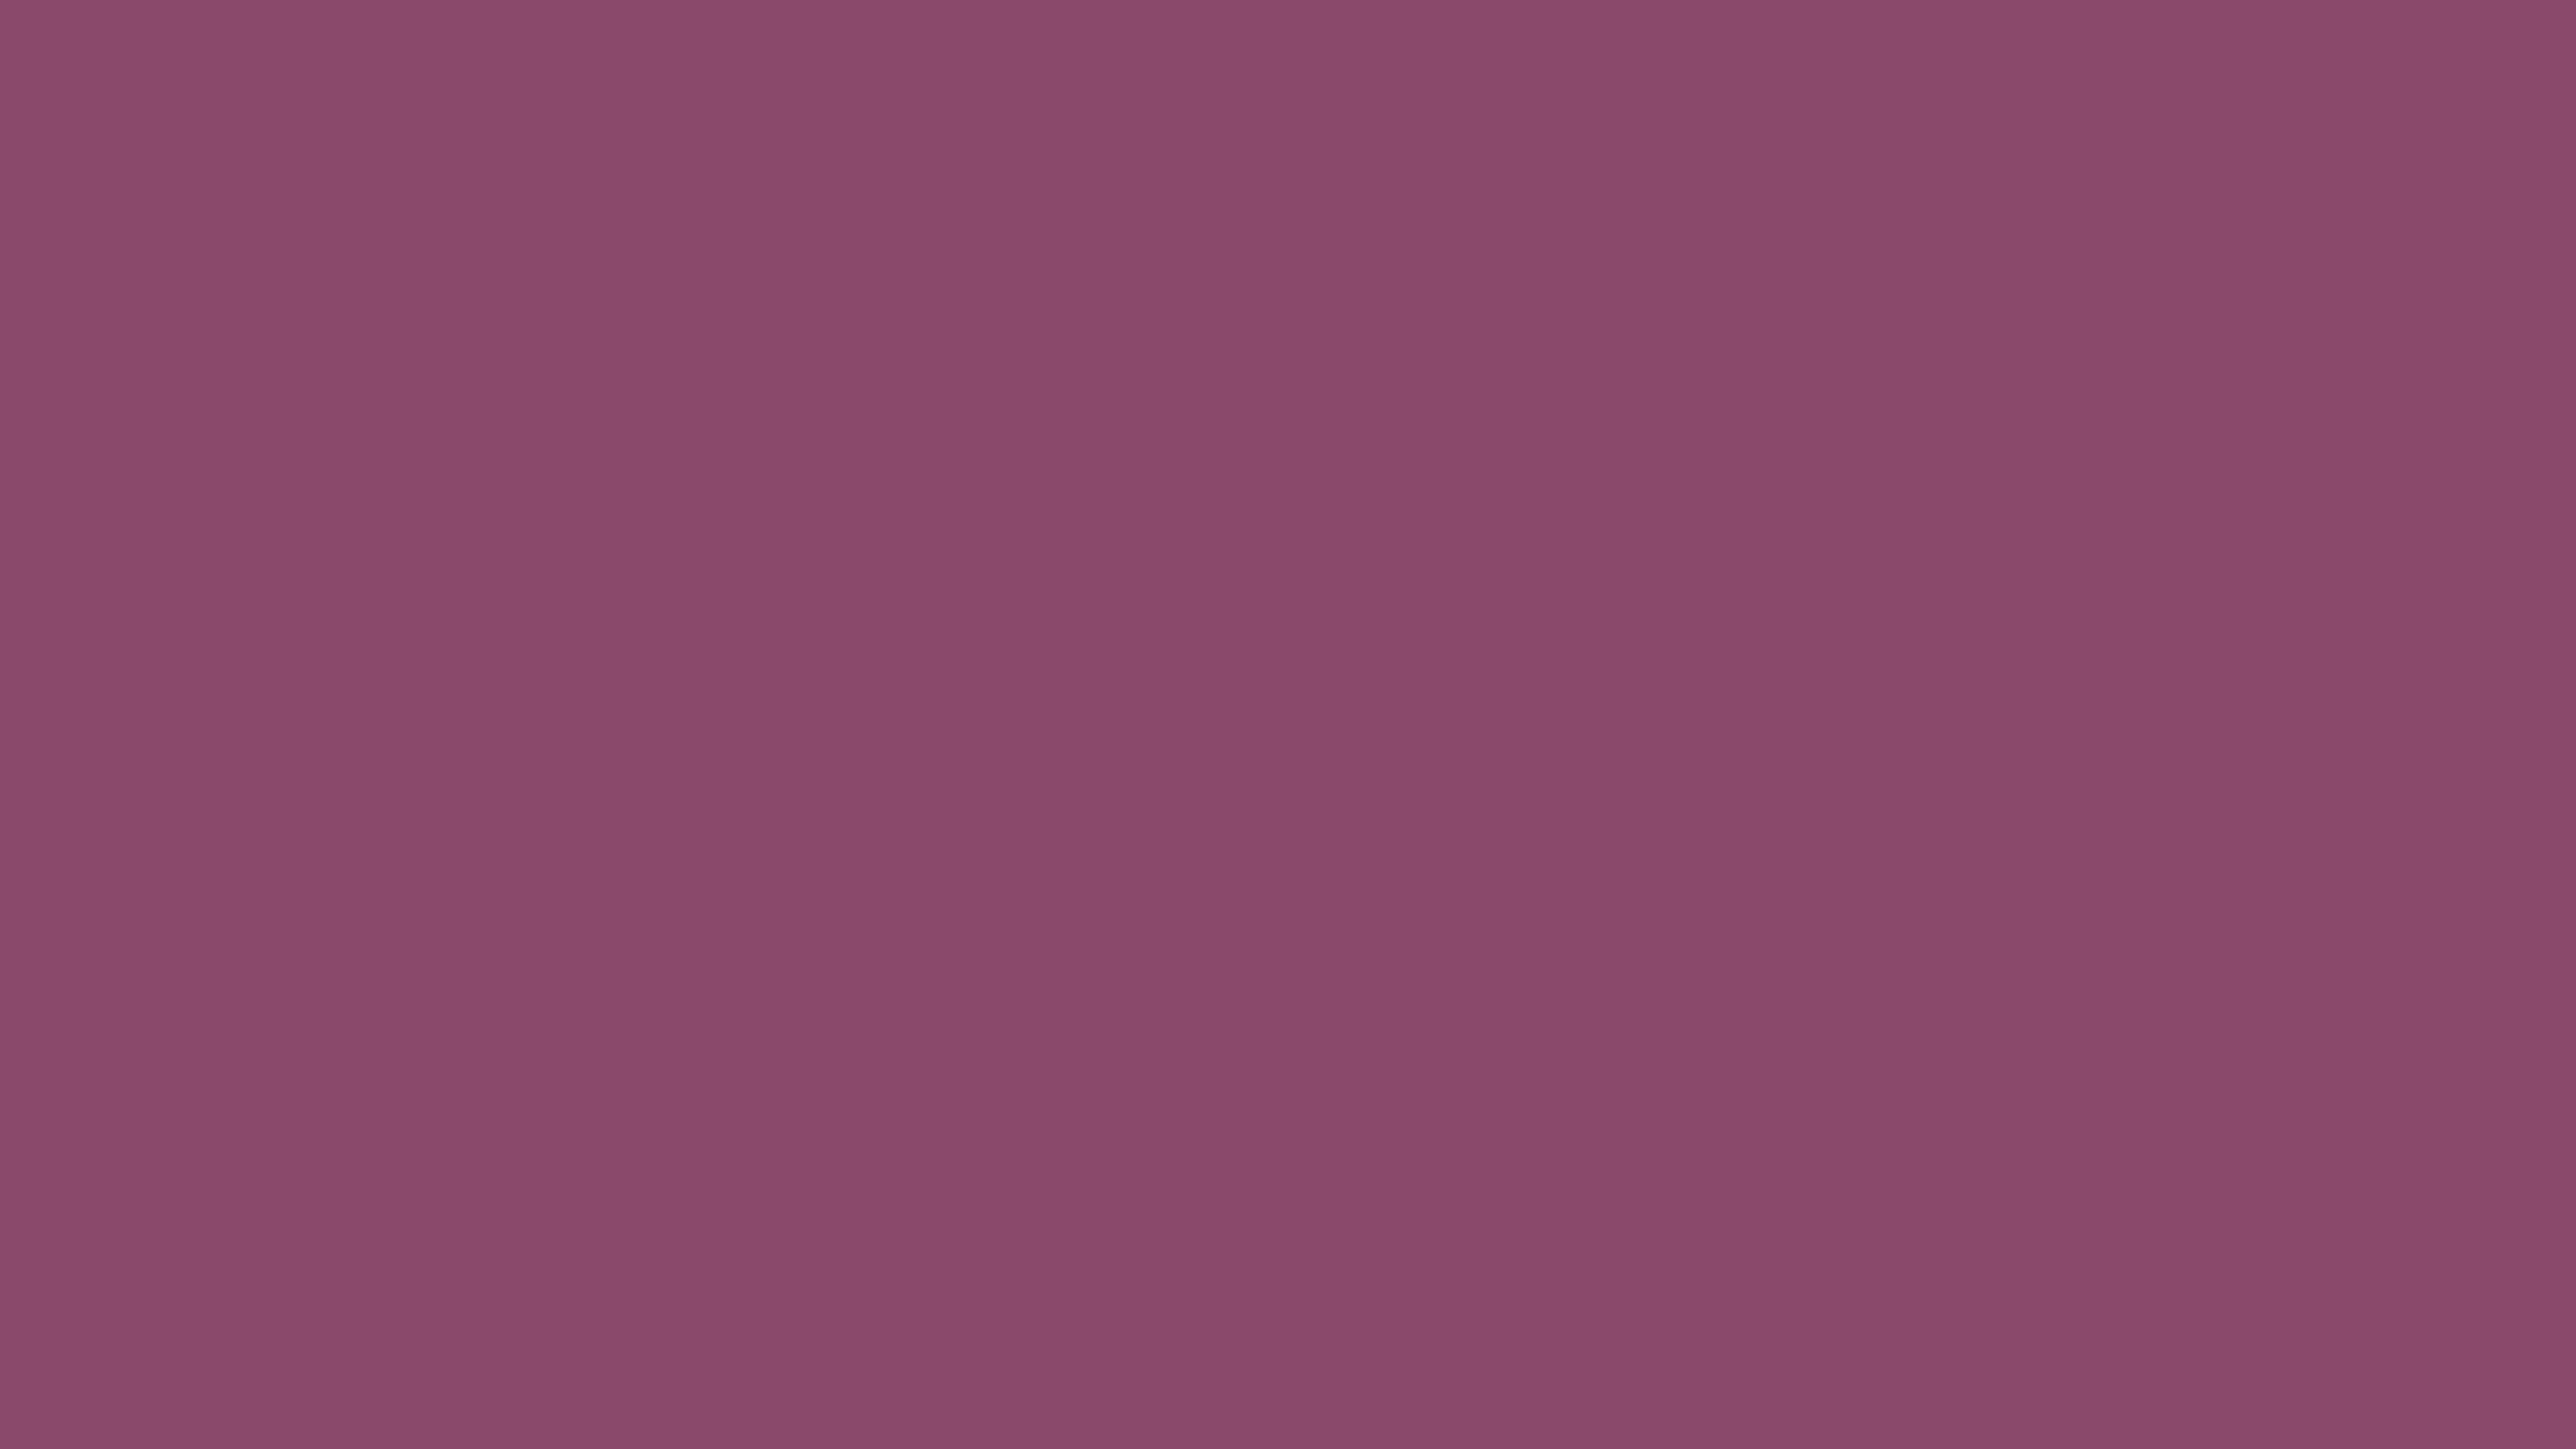 7680x4320 Twilight Lavender Solid Color Background